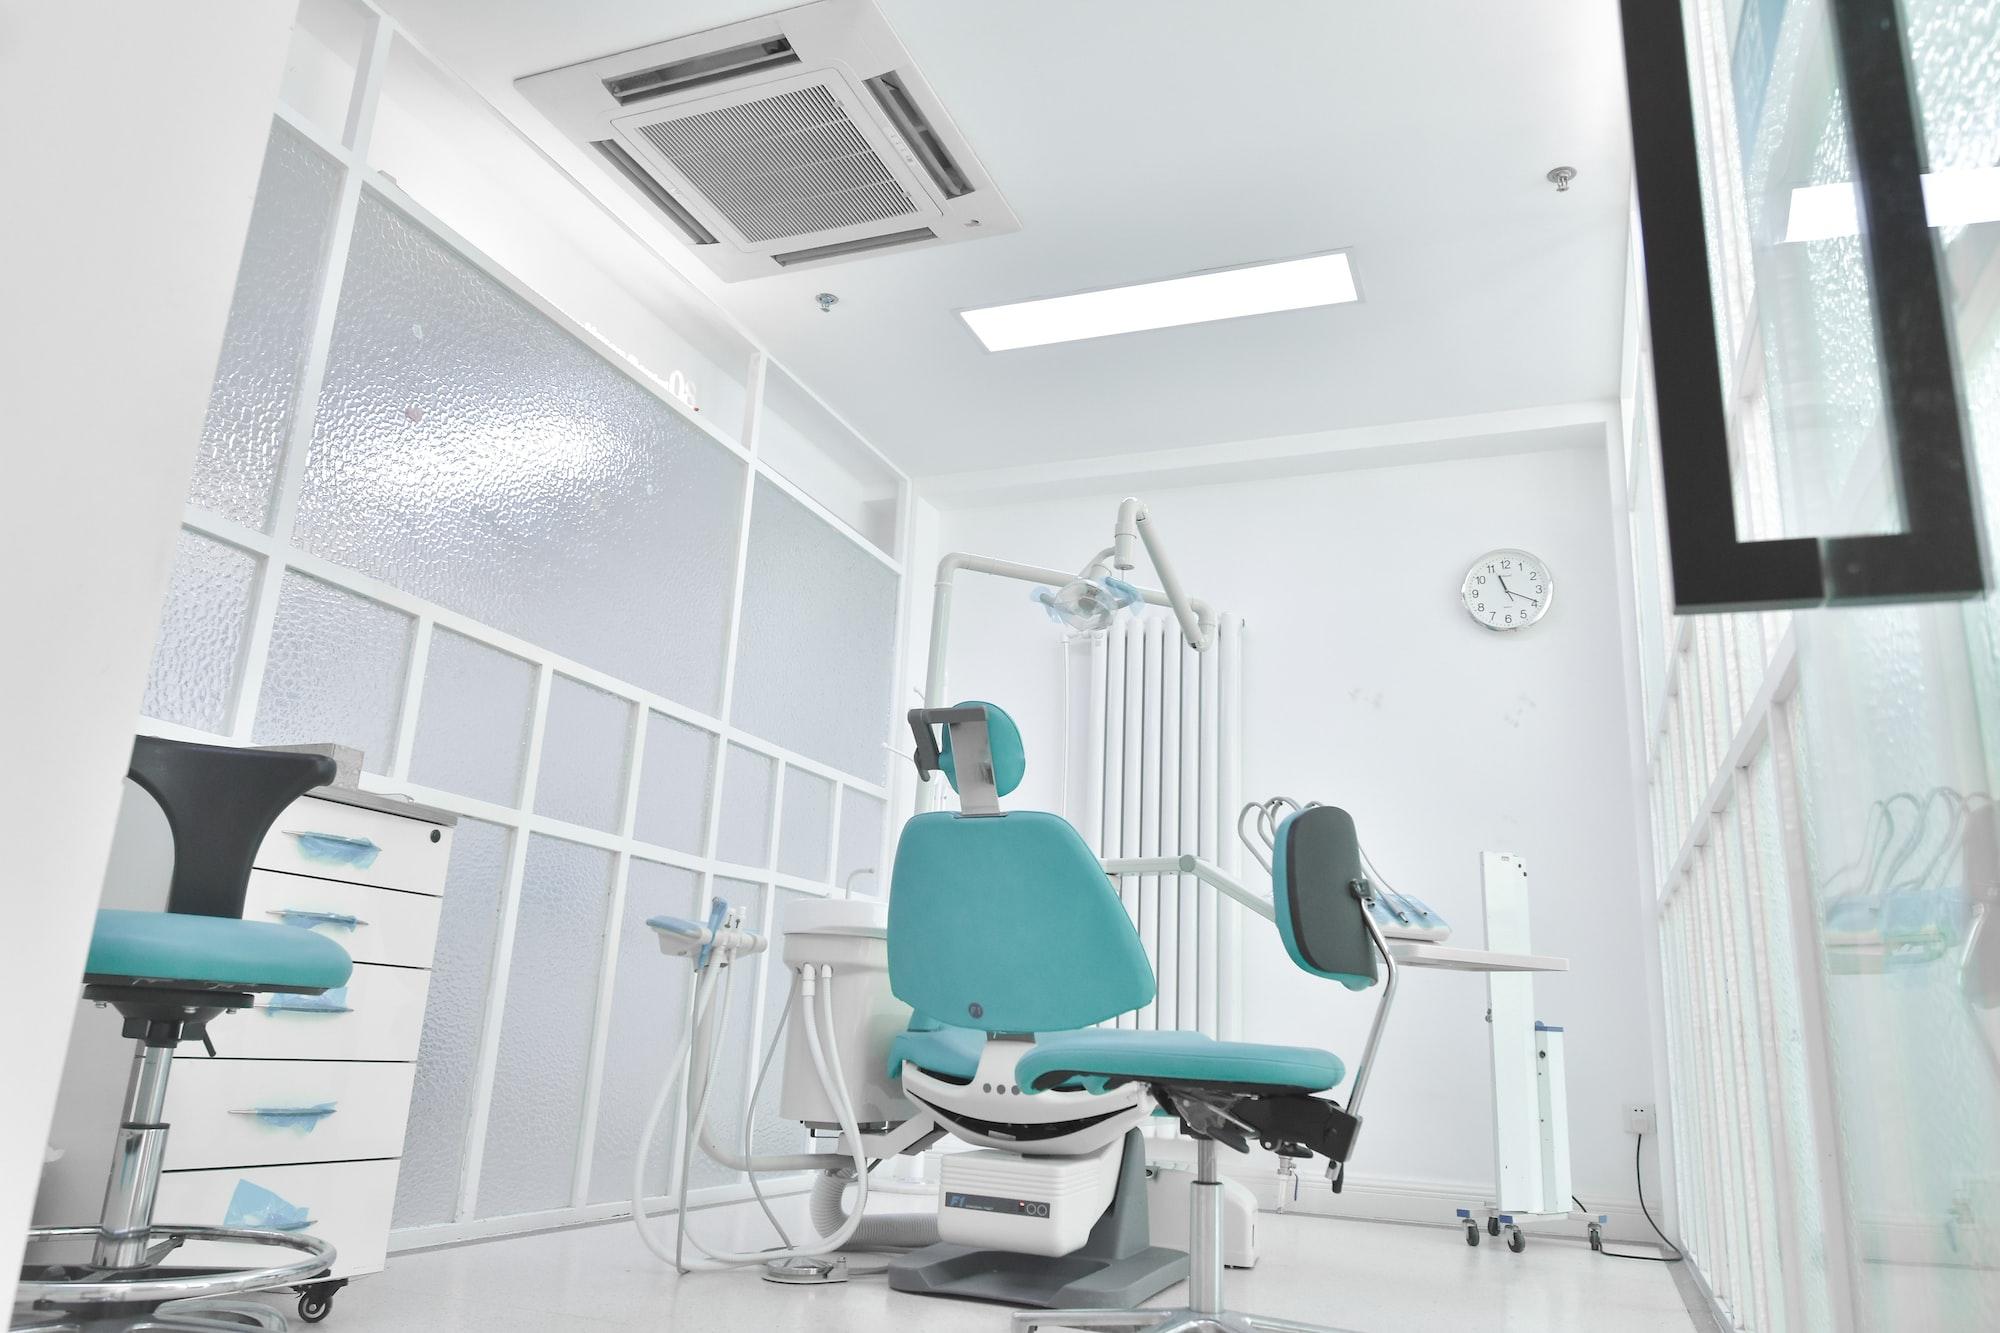 A few benefits of using DentAway